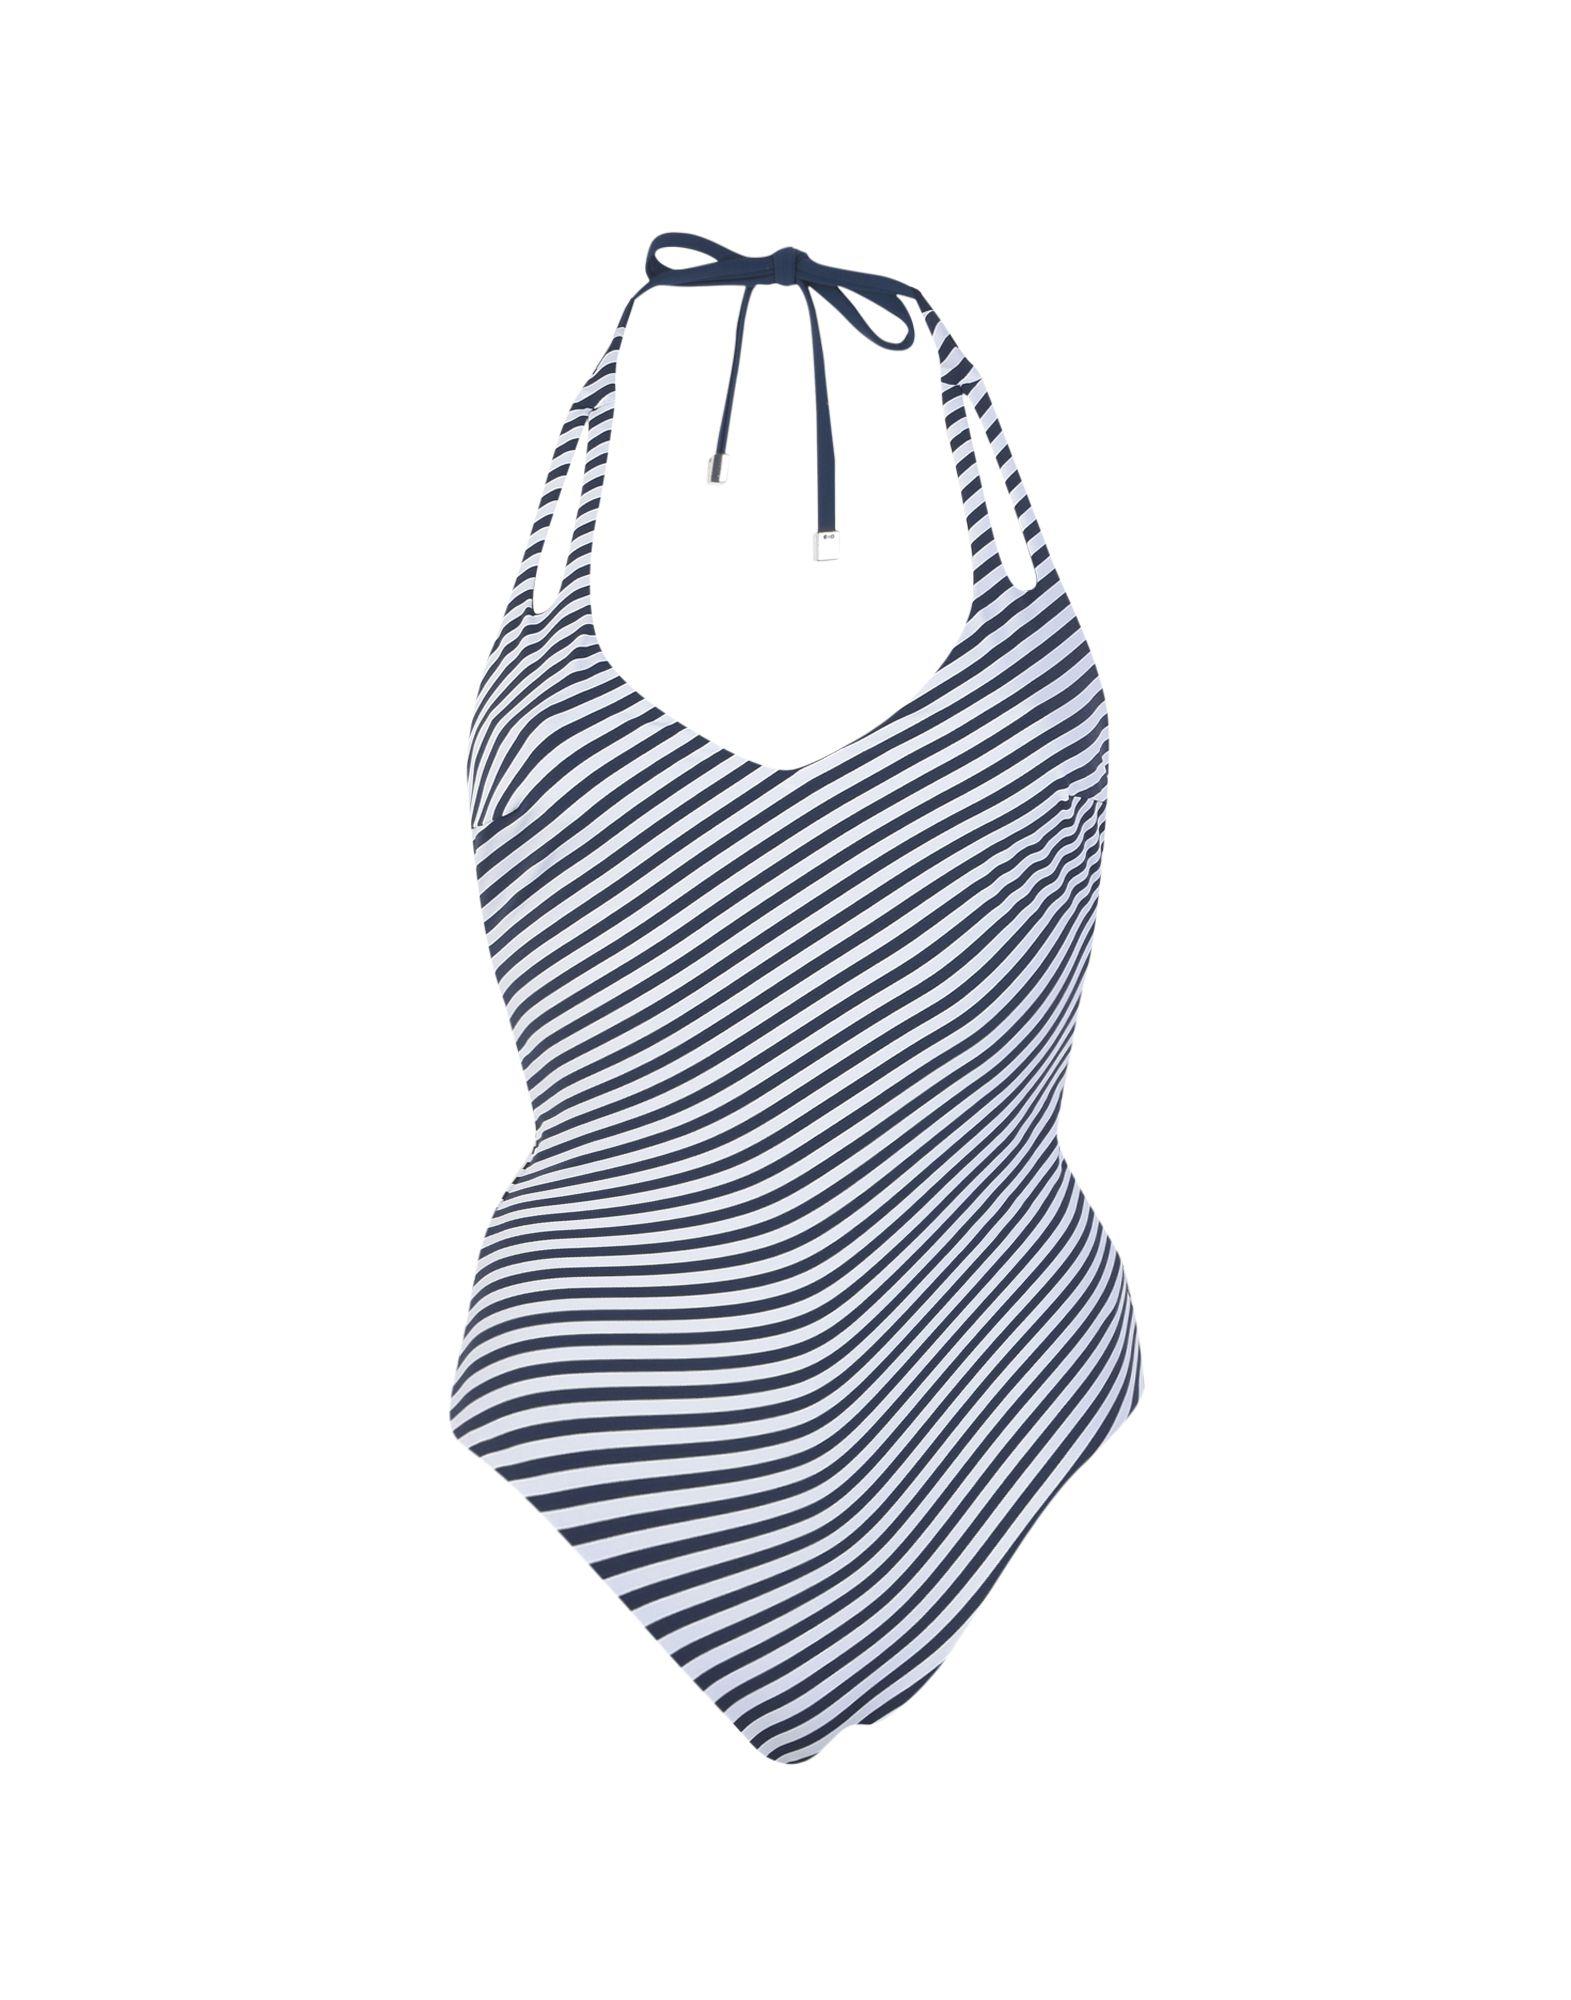 HEIDI KLUM SWIM Слитный купальник купальник sea swim 3071